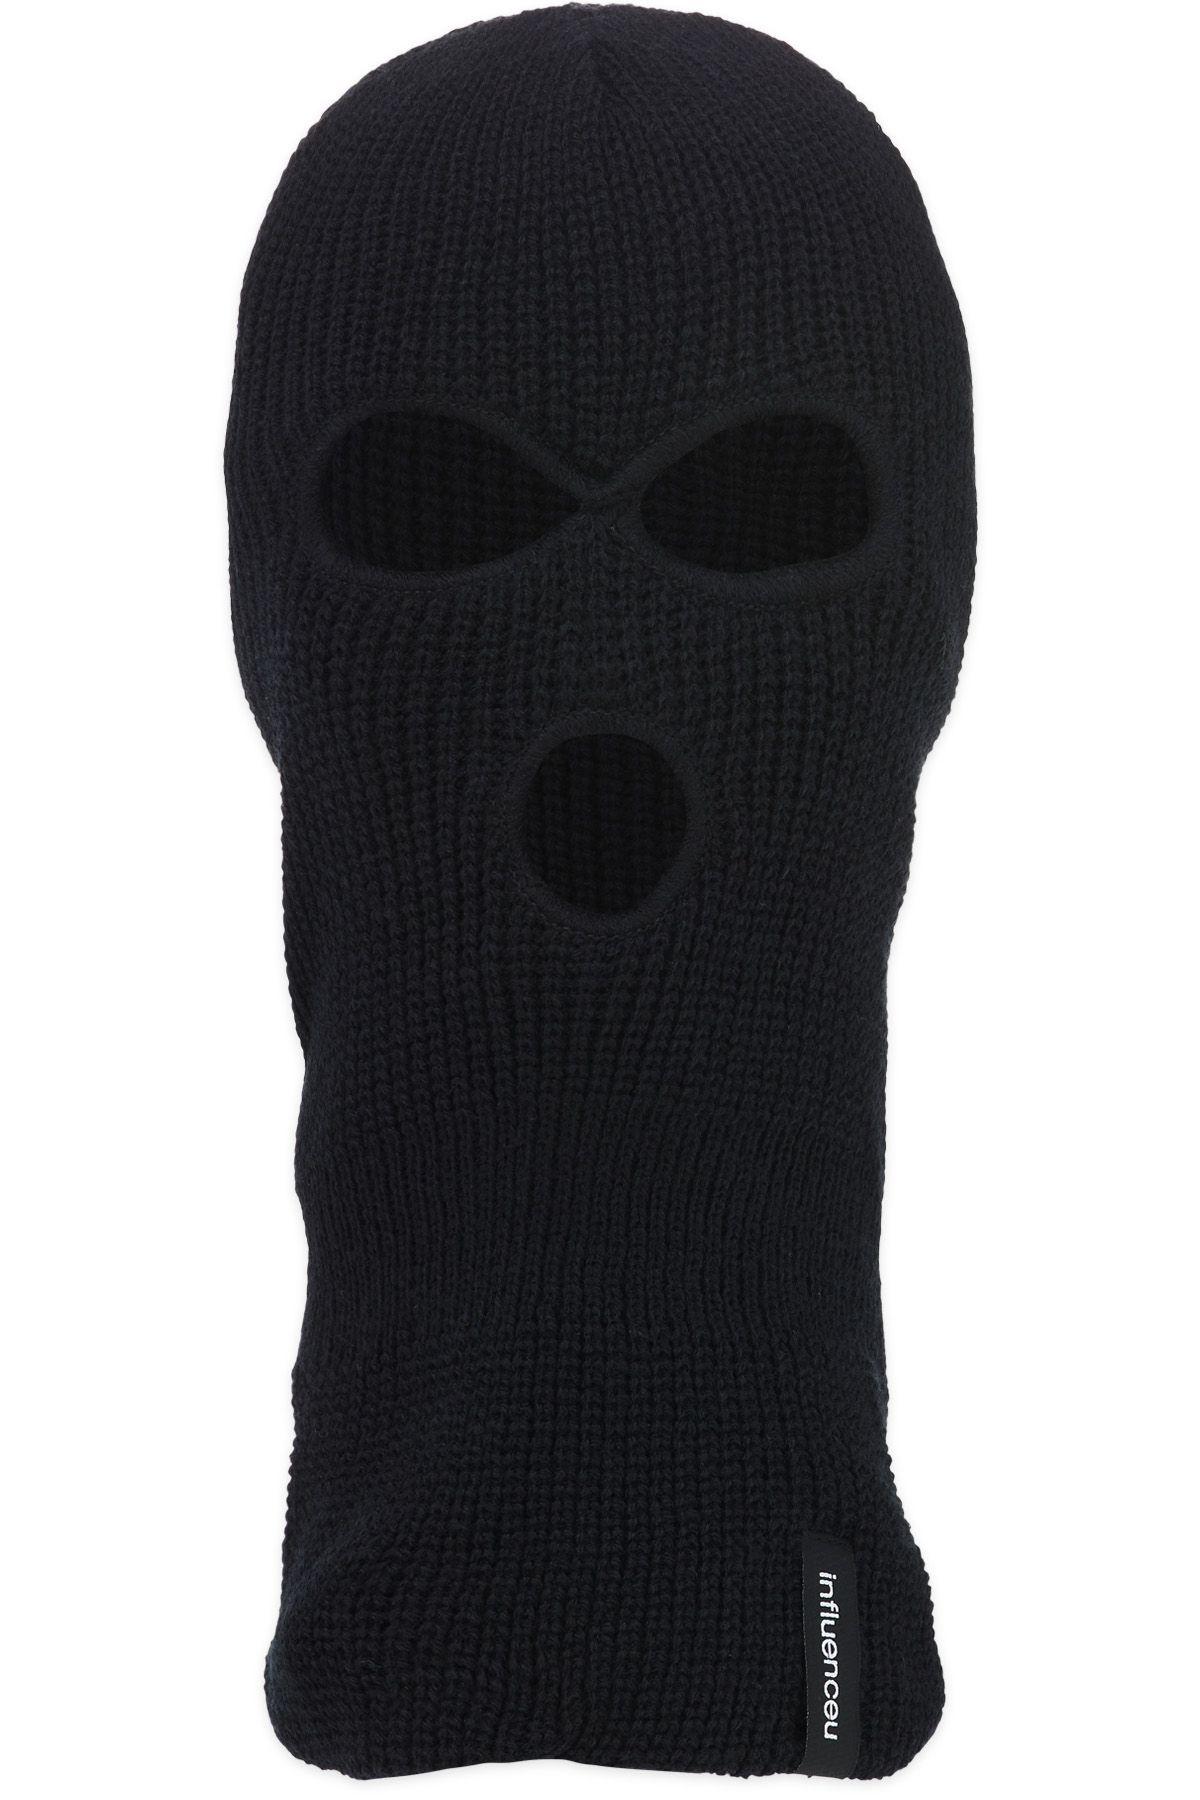 Influenceu Three Hole Ski Mask Balaclava Black In 2021 Ski Mask Balaclava Black